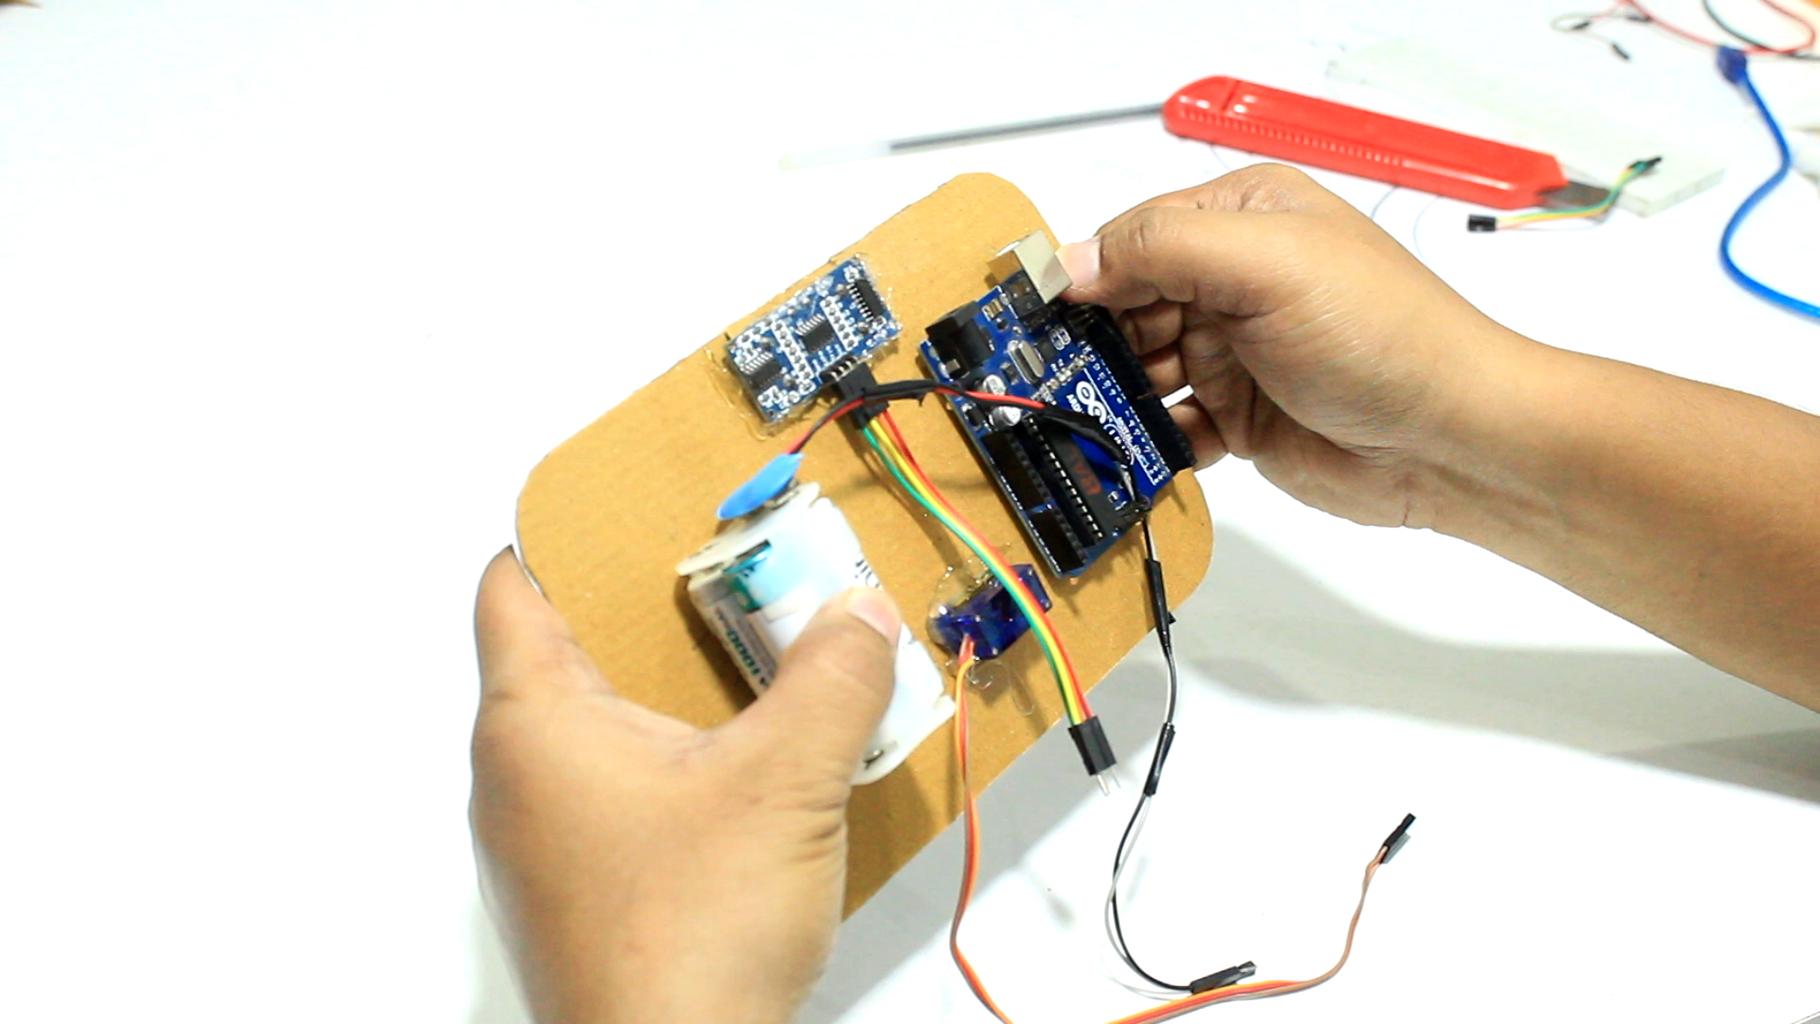 Connecting Arduino & Sensors